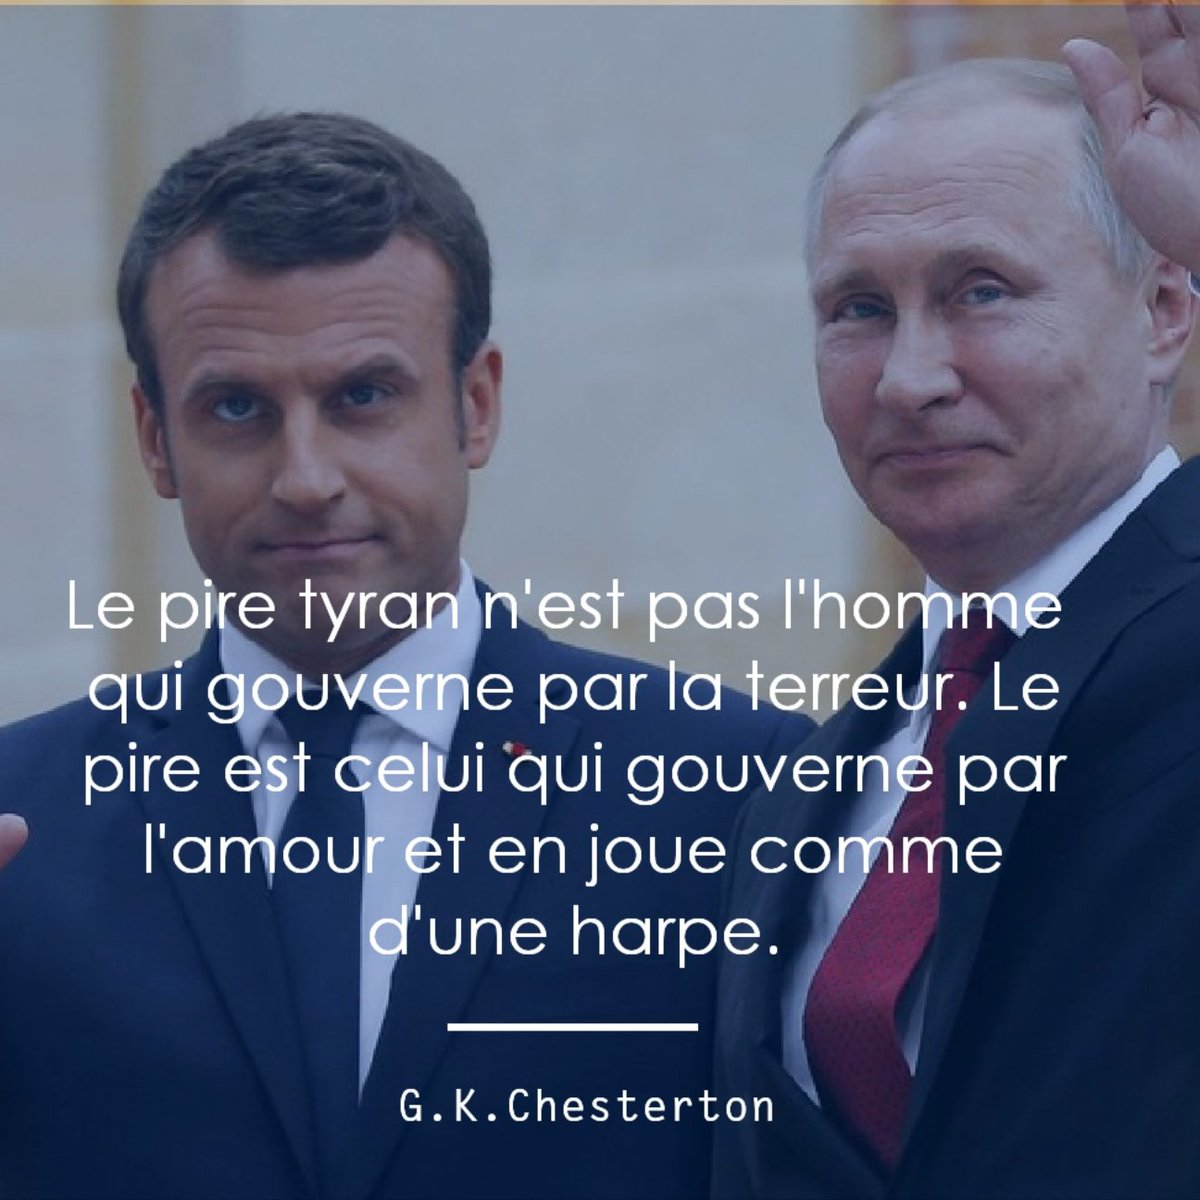 (game of Monarchy )  #melenchon #macron #LREM #france2 #lesrepublicains #cnews #BFMTV #franceinfo @TeamMacronPR  #AssembleeNationale<br>http://pic.twitter.com/13GaTothji